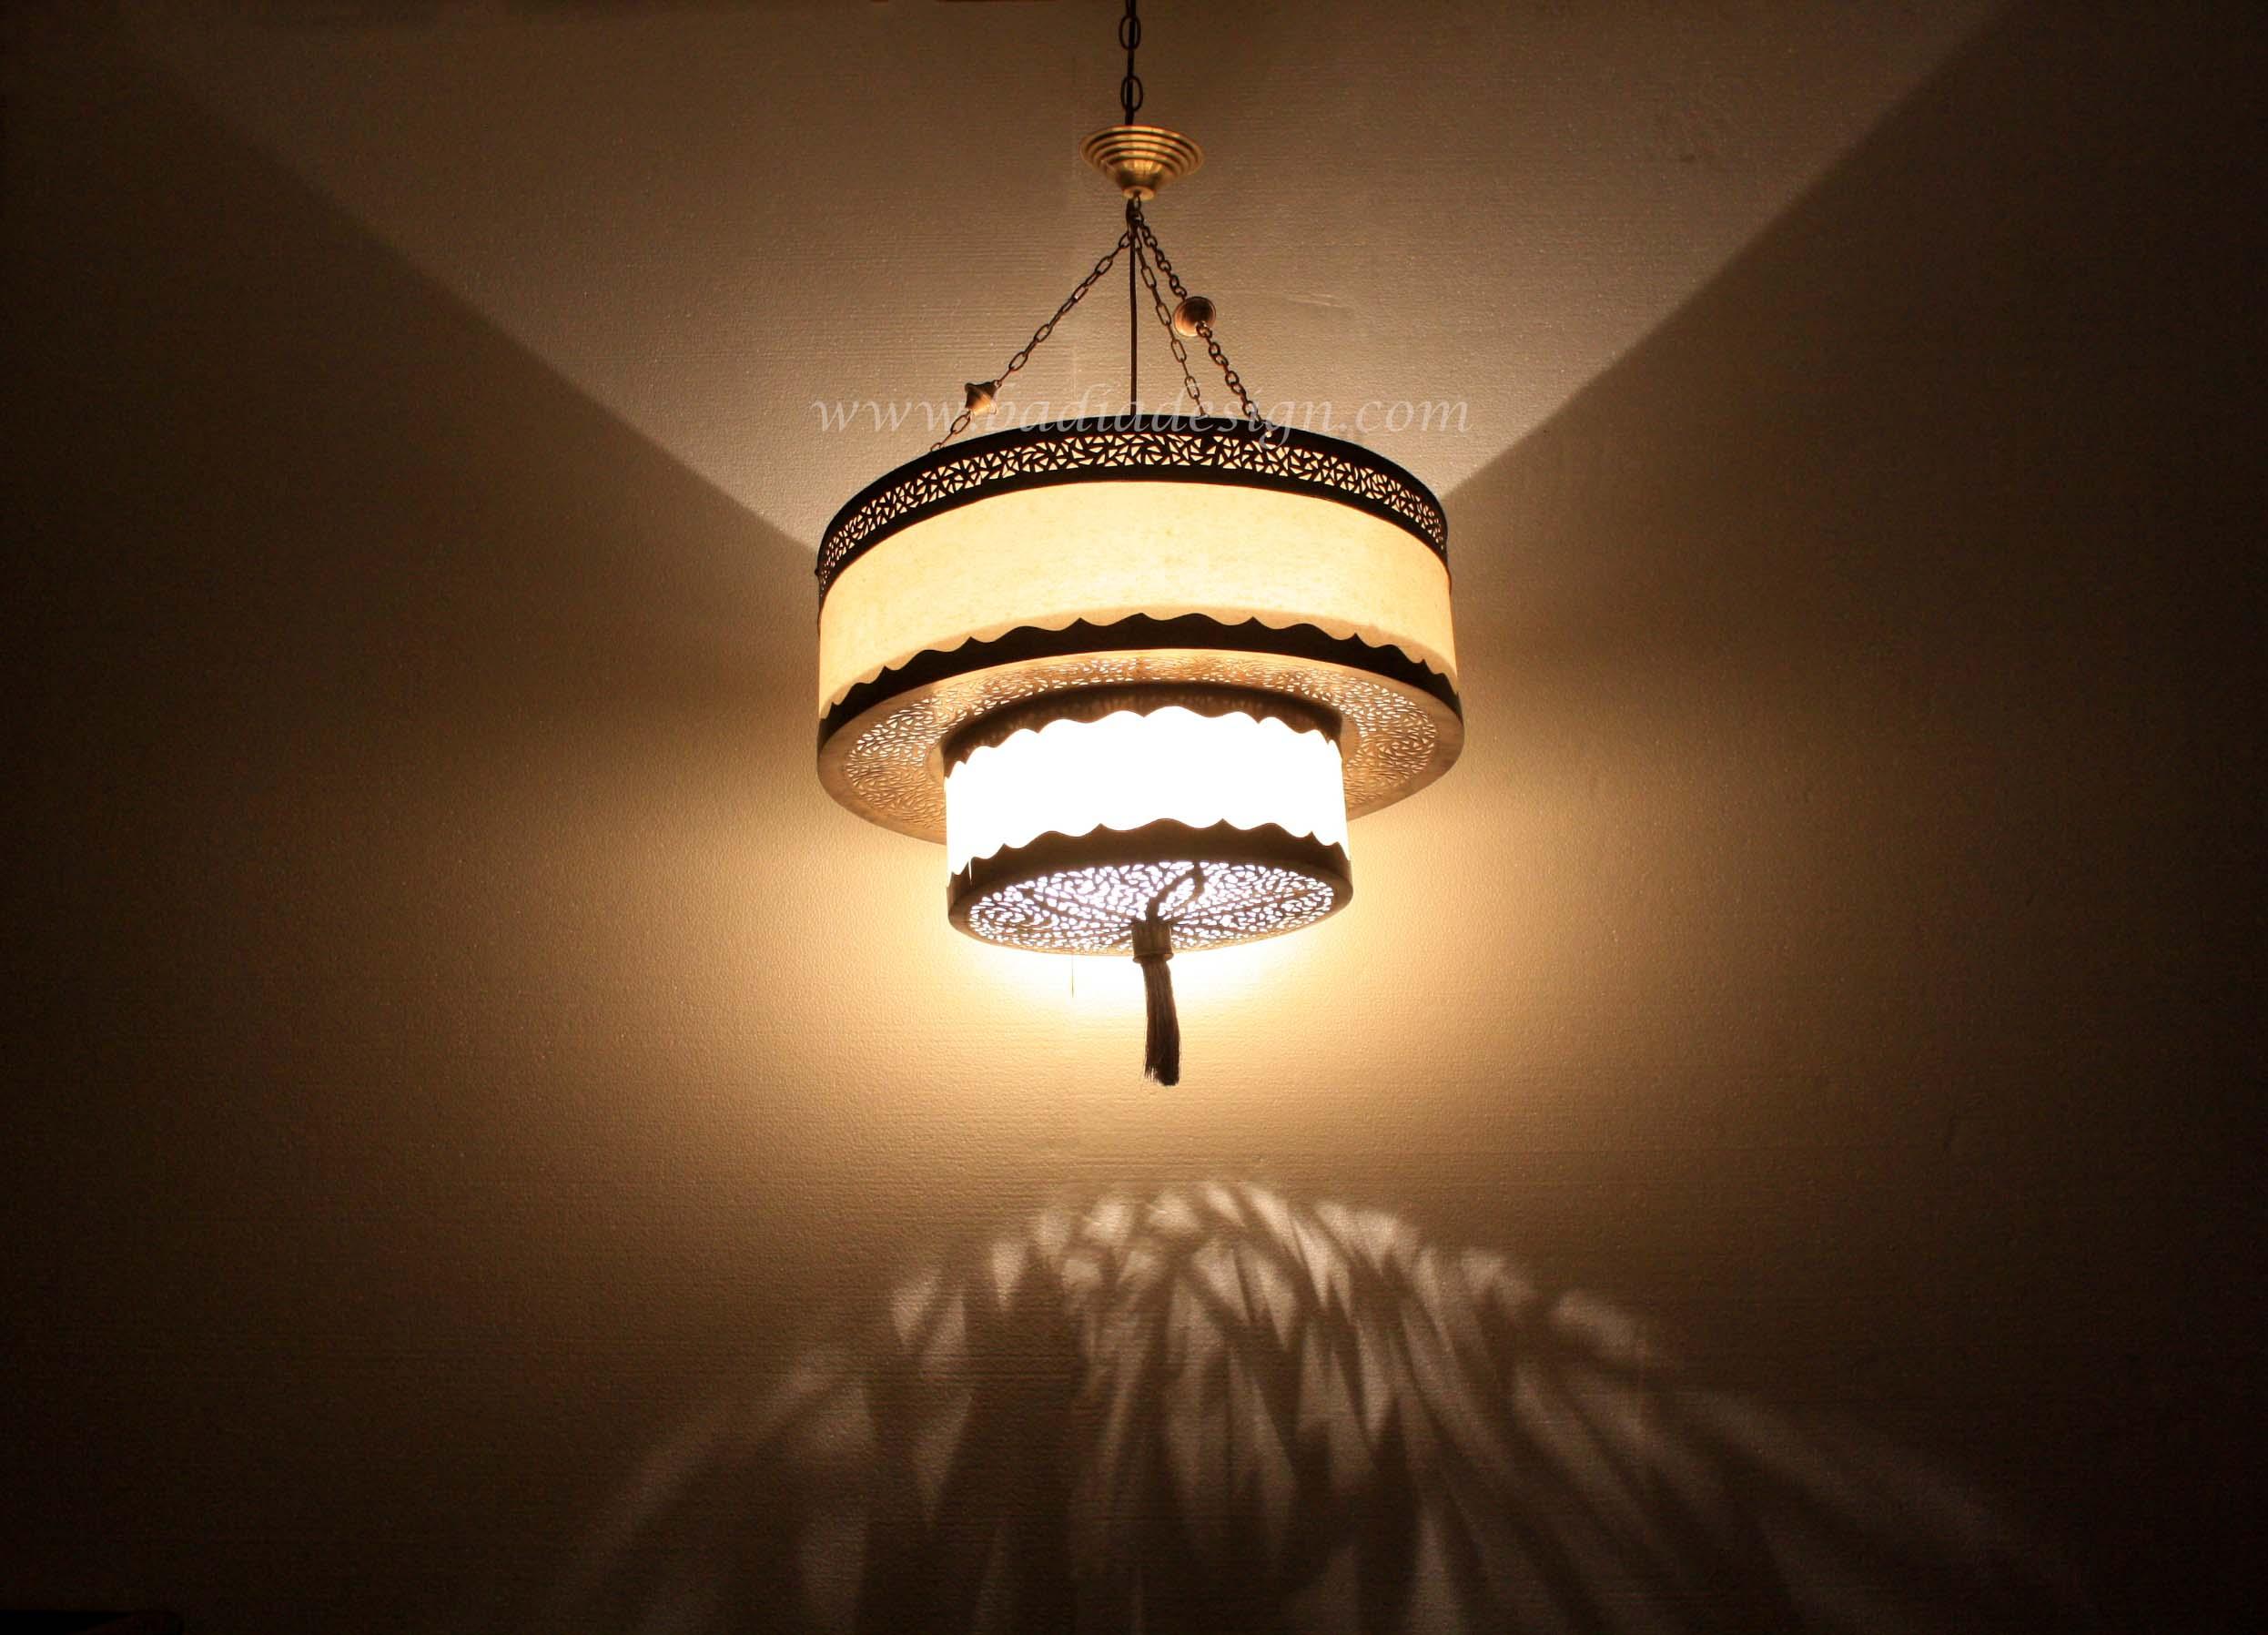 moroccan-upside-down-cake-light-fixture-lig248-1.jpg